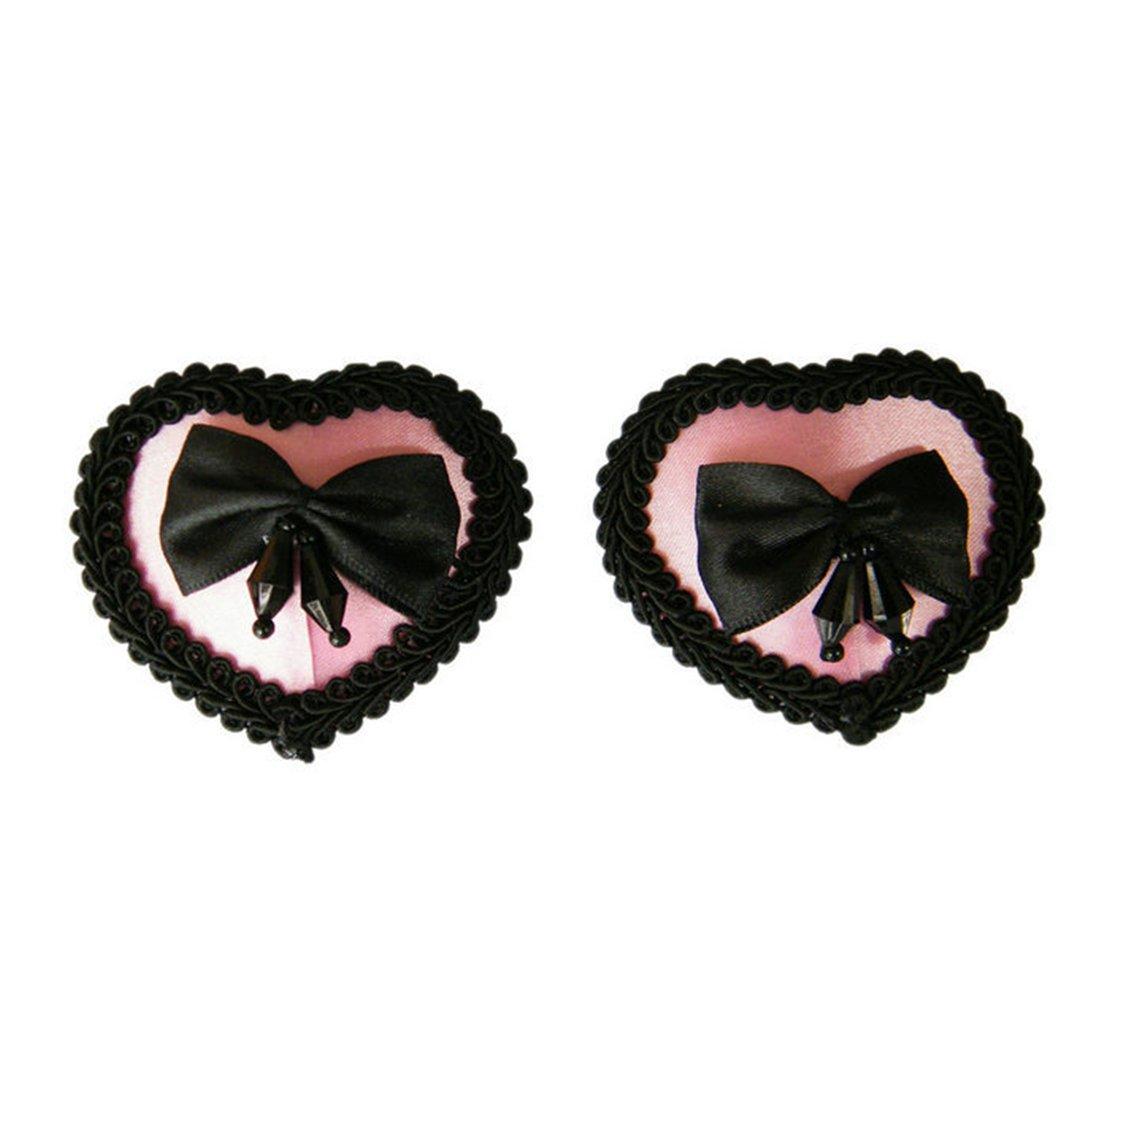 Czj-Innovation® Reusable Breast Petals Bow-tie Pasties for Women KAYA-ABRNC-106-01